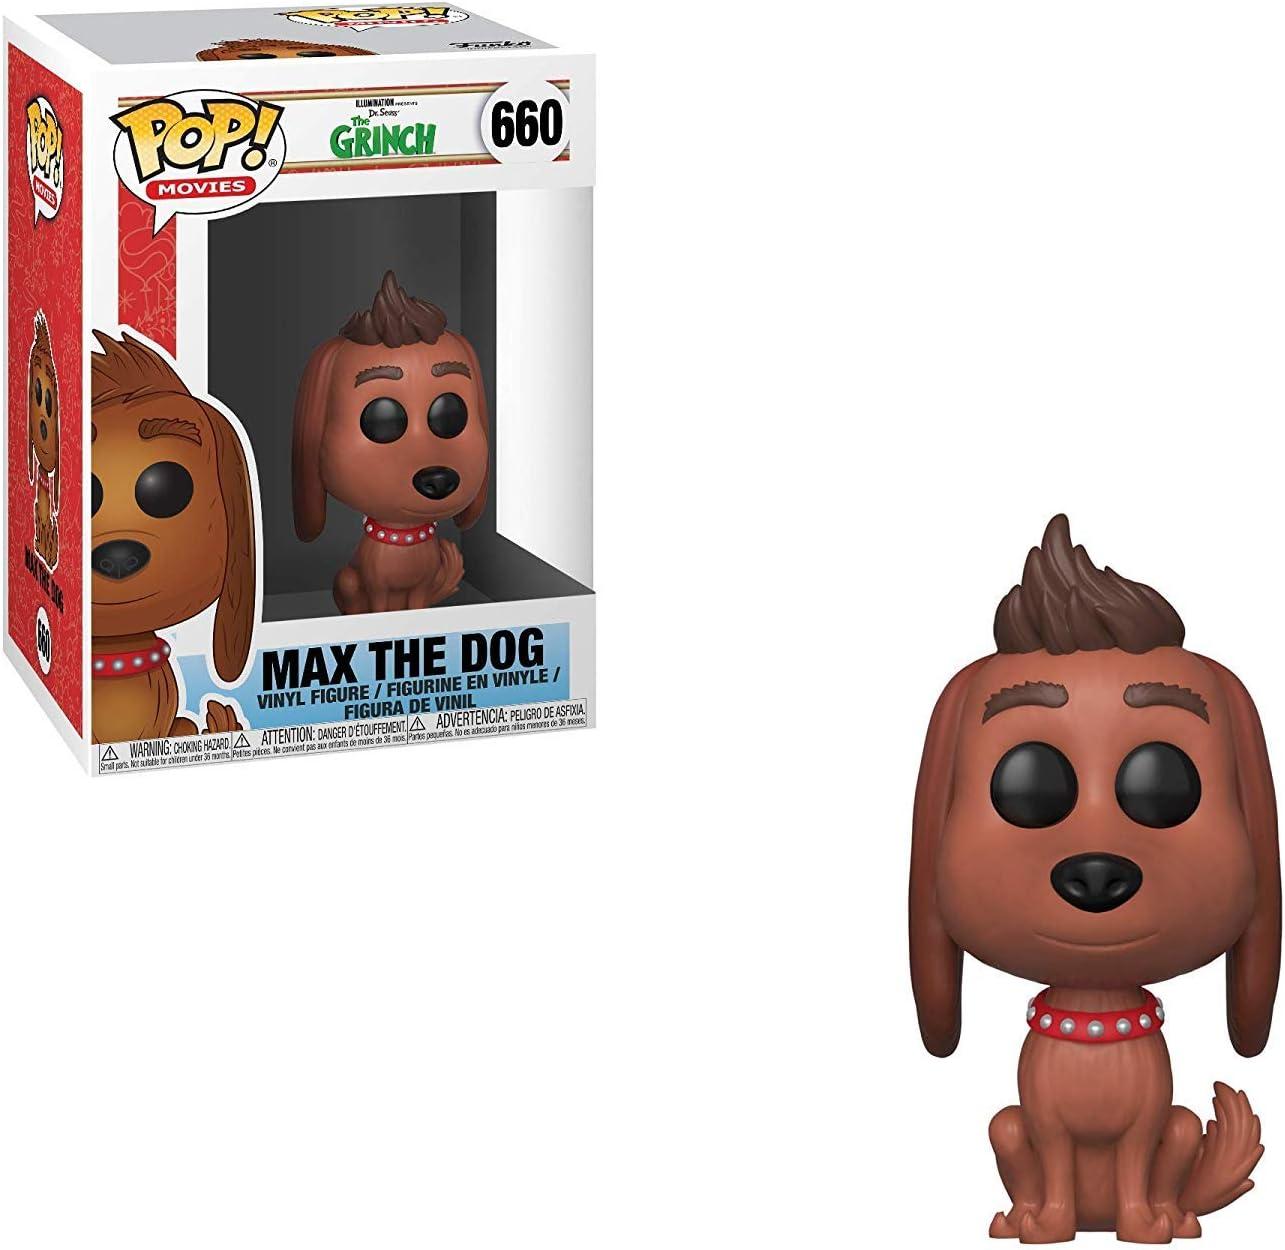 Funko Pop Animation: The Grinch Movie - Max The Dog Collectible Figure, Multicolor